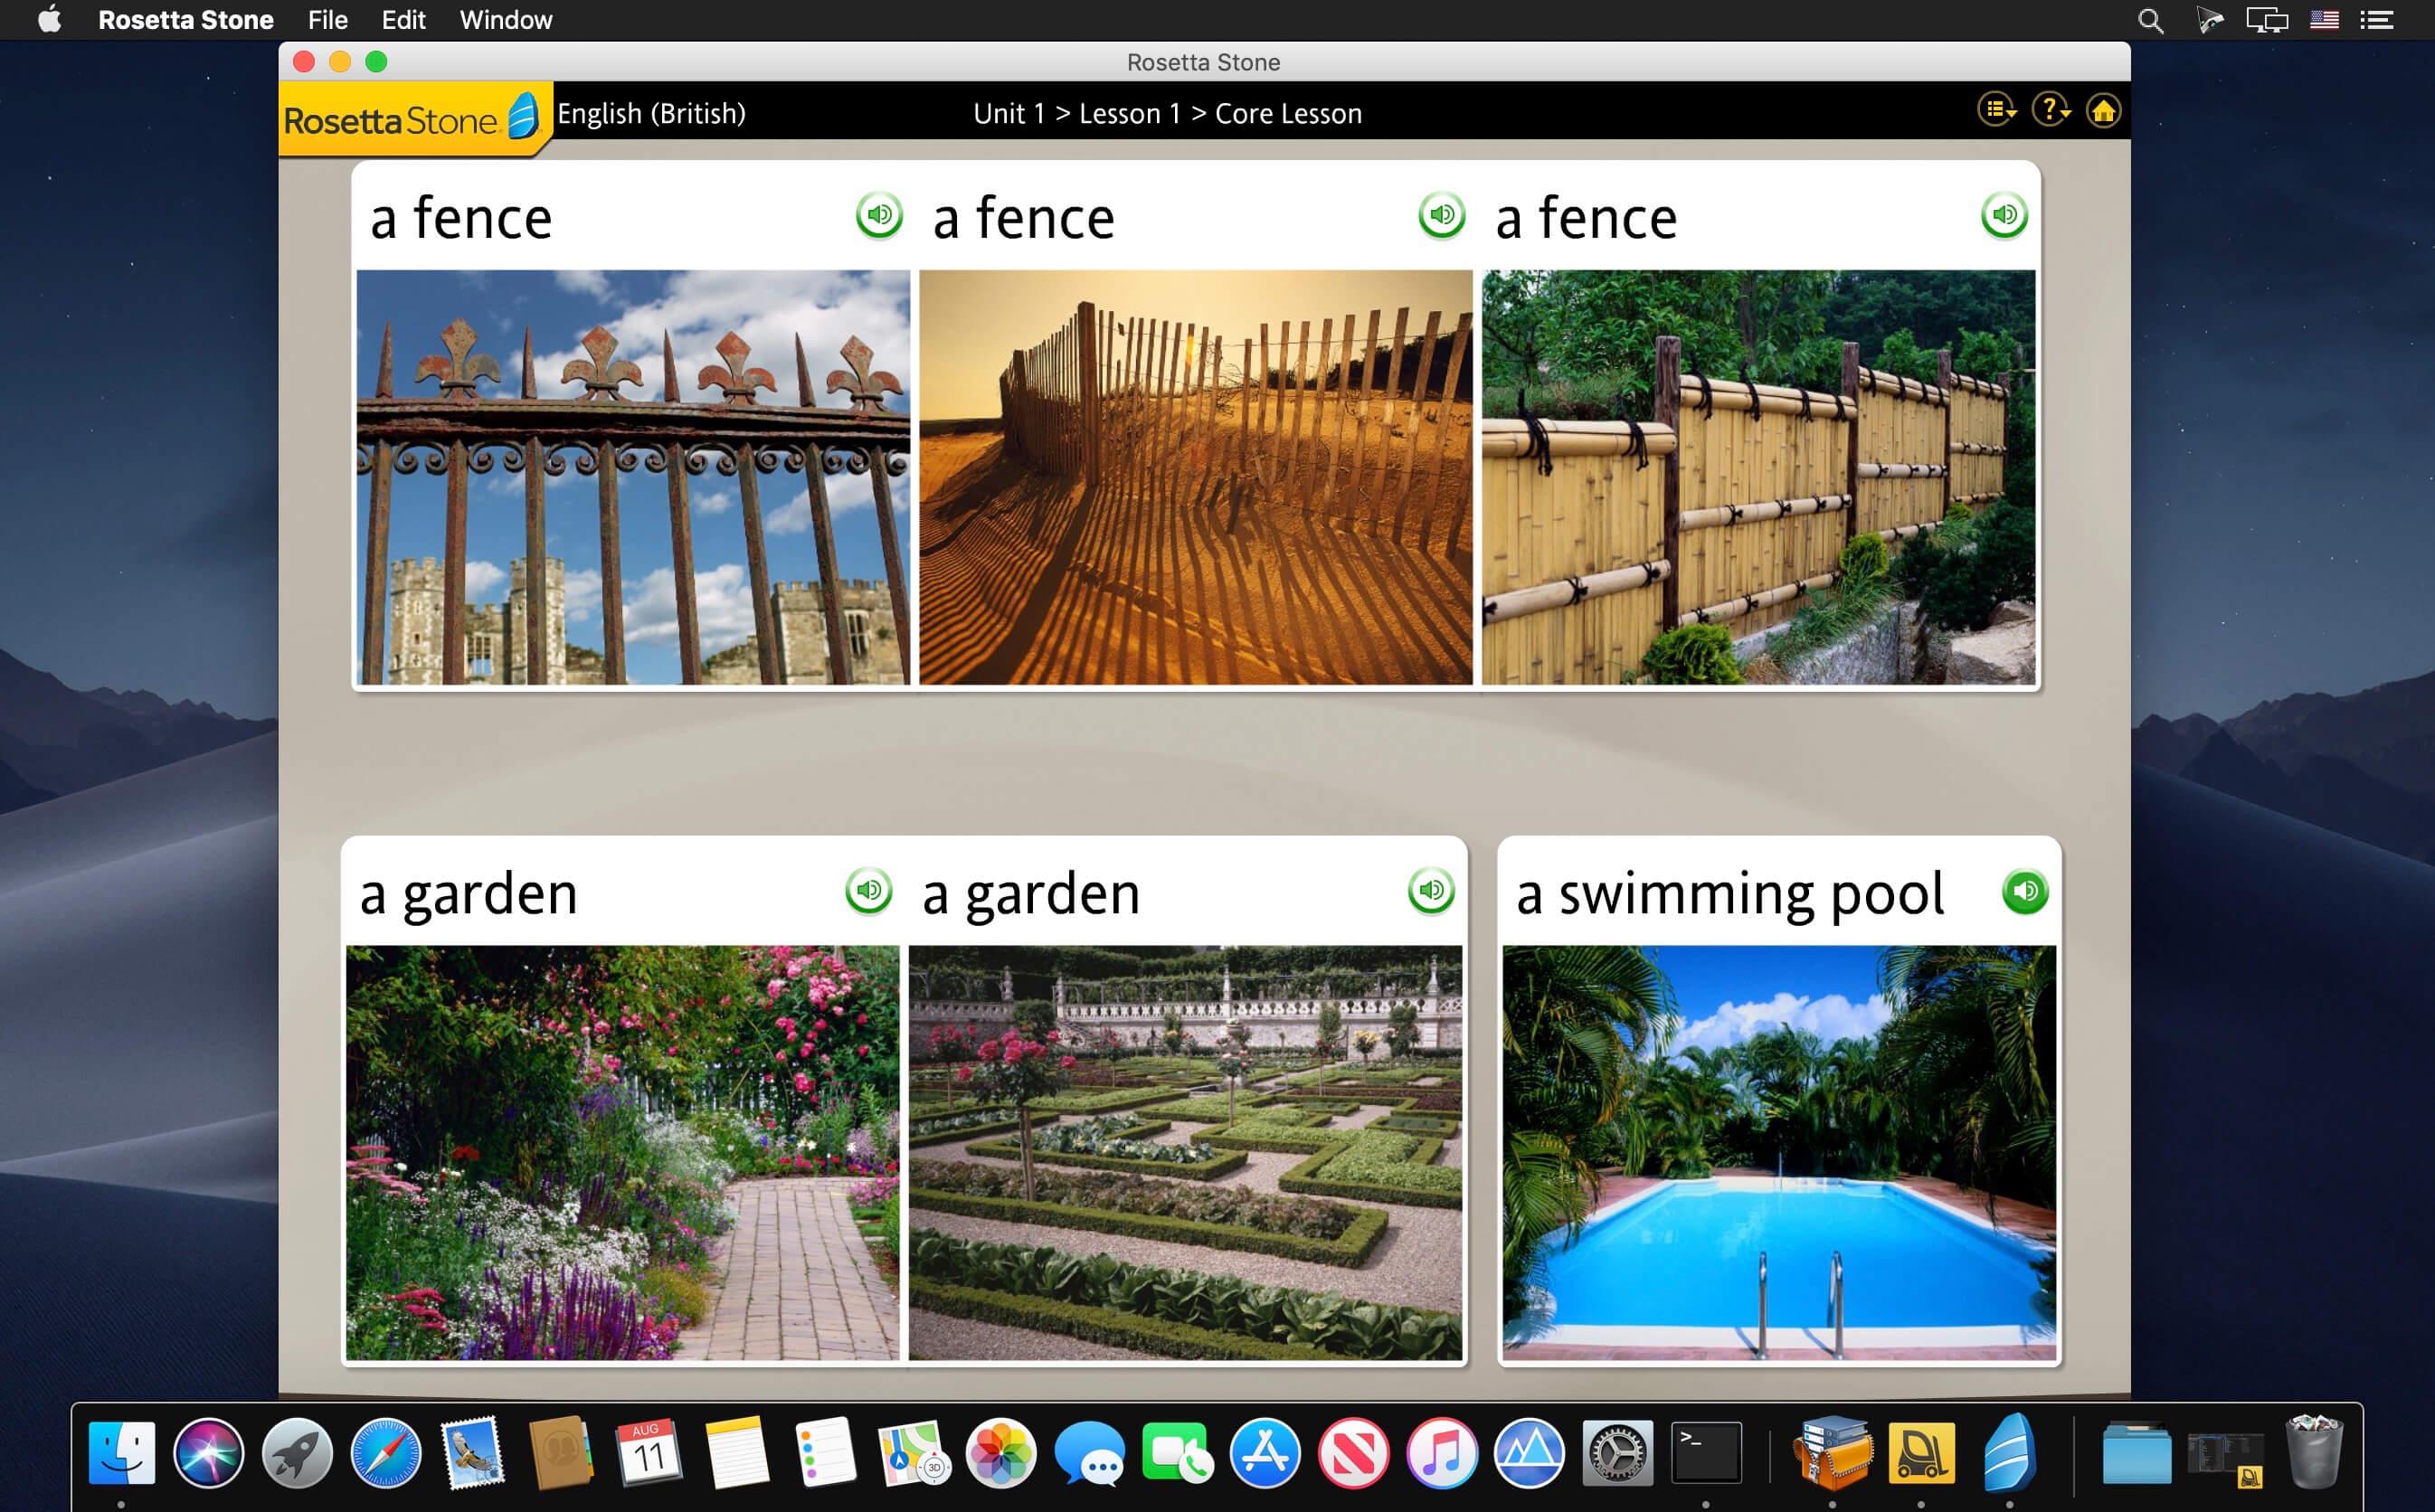 rosetta stone for mac download free